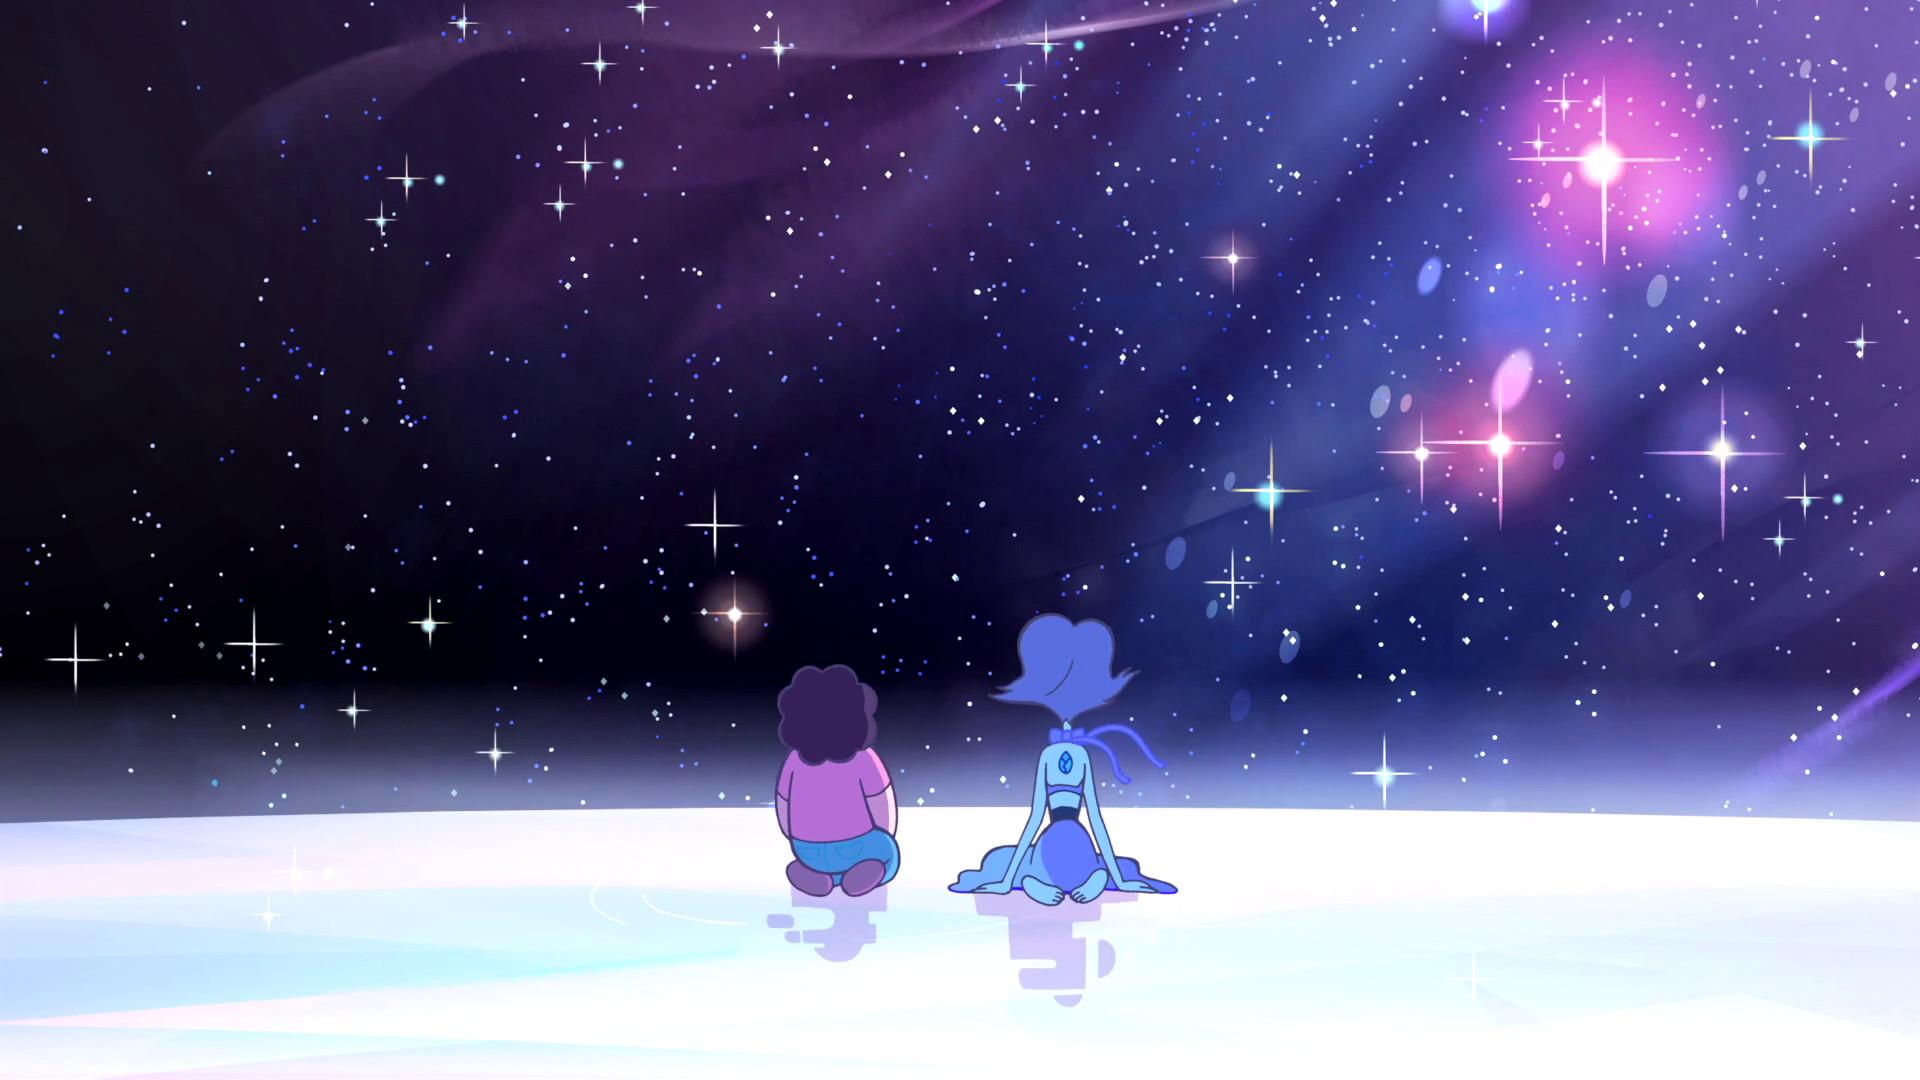 steven universe backgrounds – Google Search